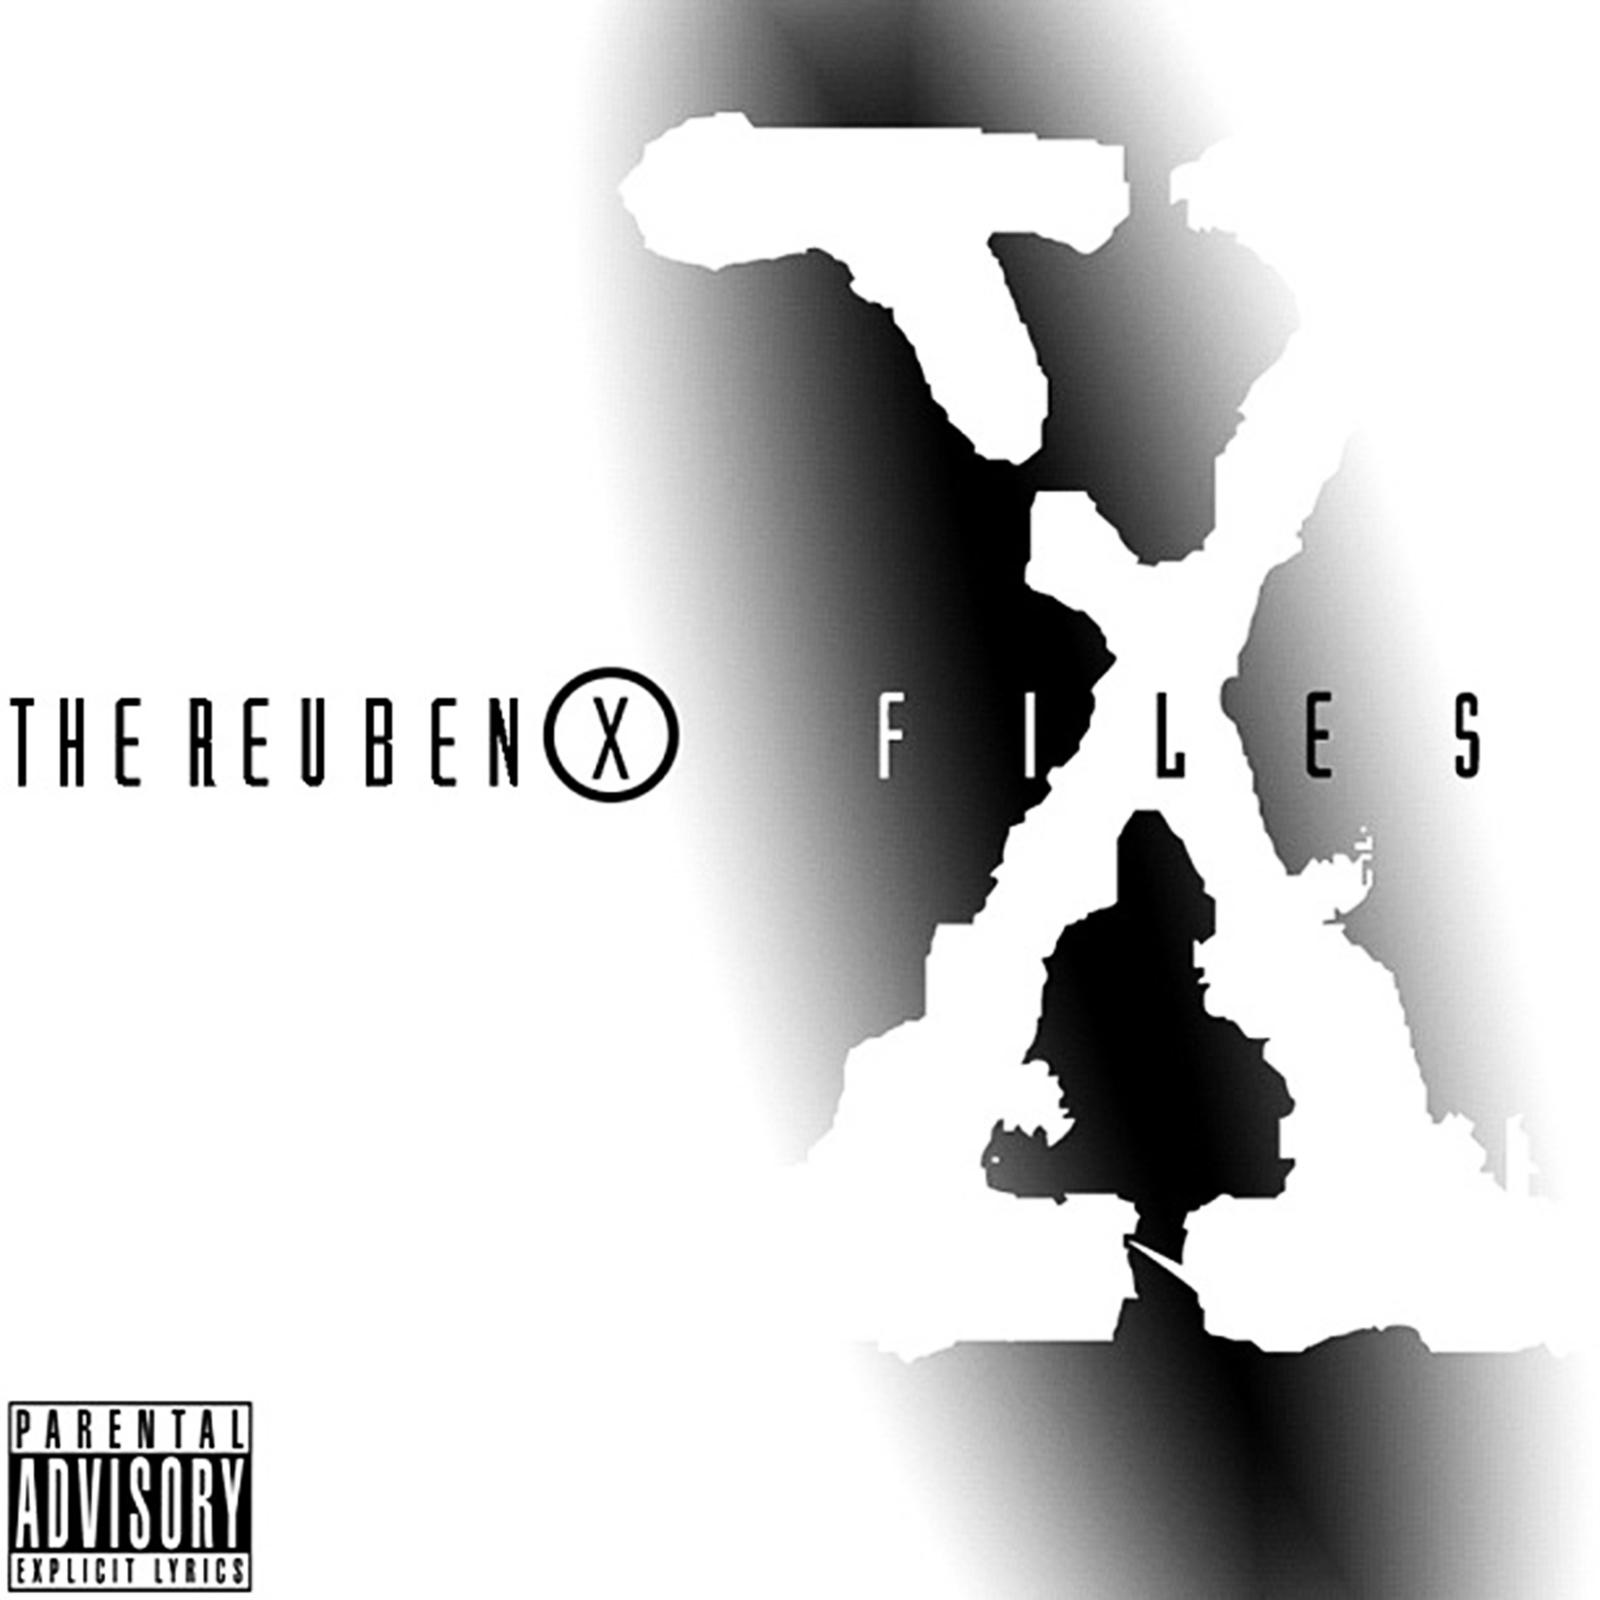 reubenx files cover.jpg